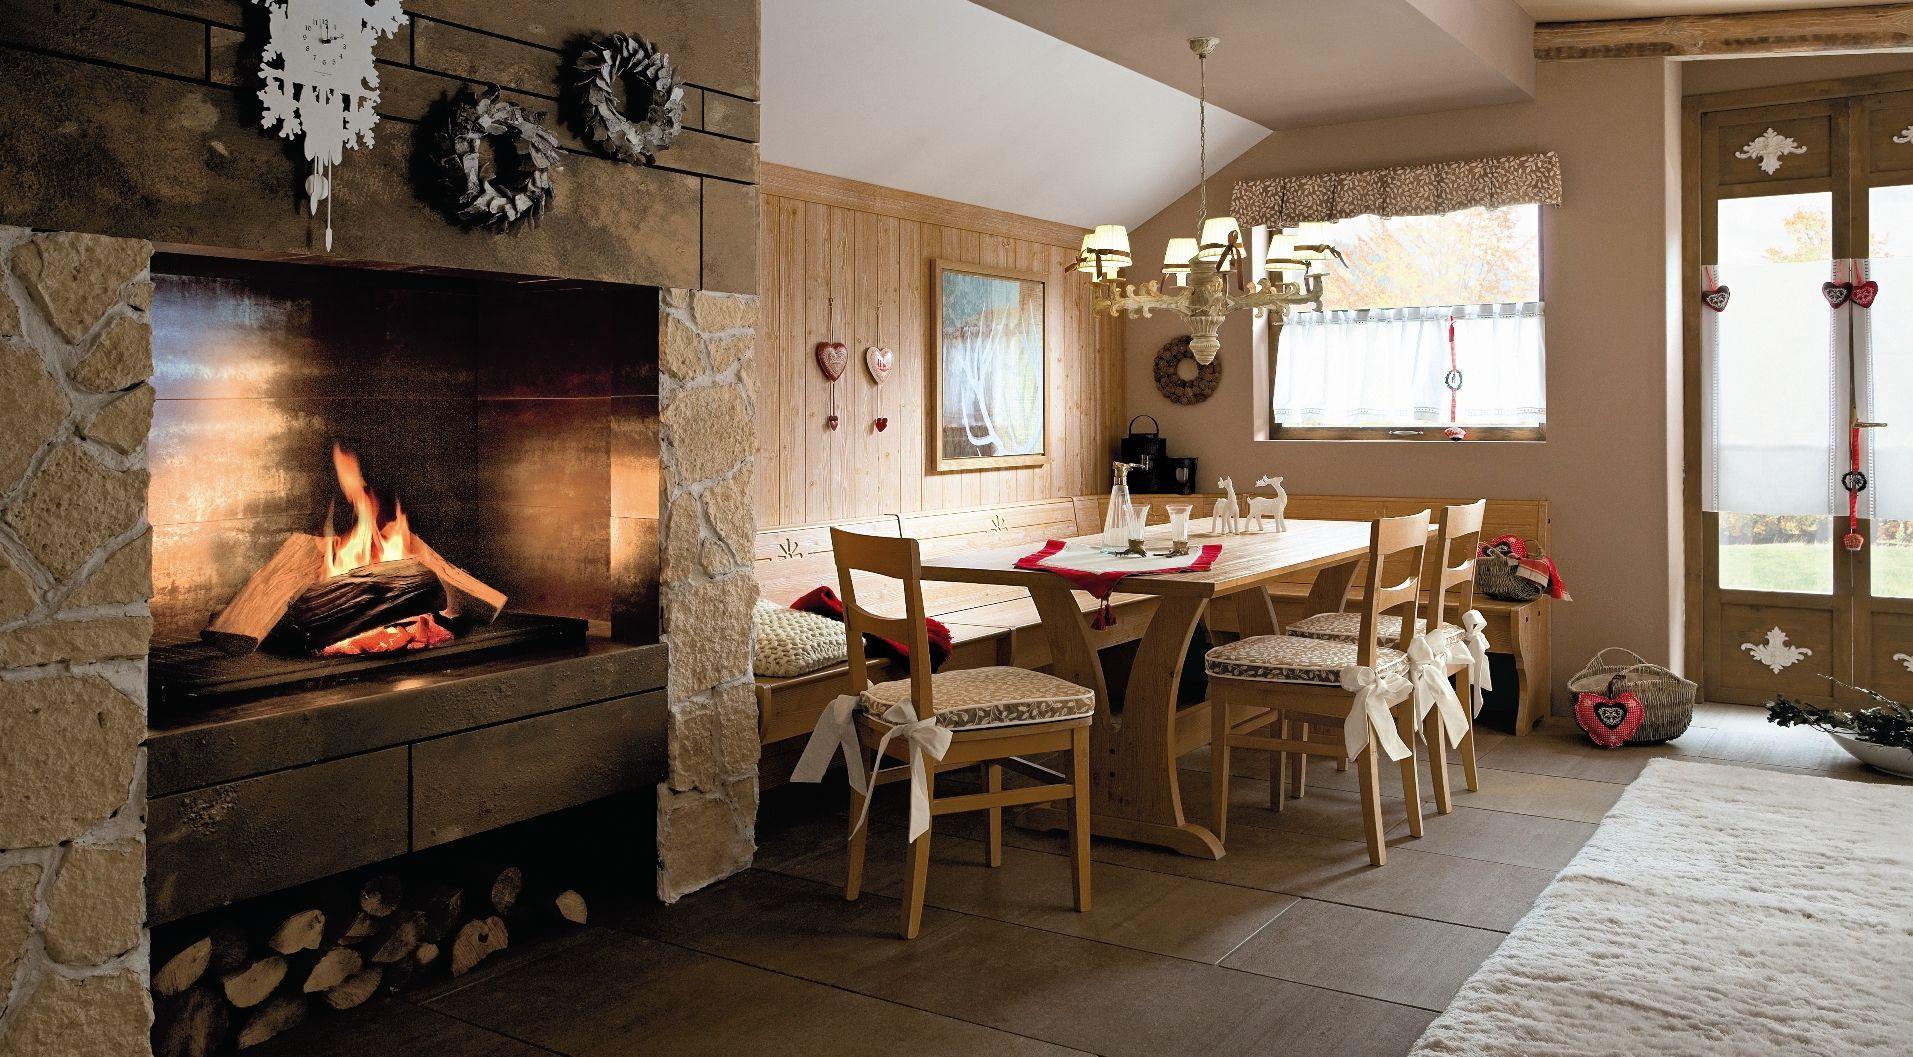 Cucina Stile Rustico : Cucina stile rustico toscano. Mobili cucina ...